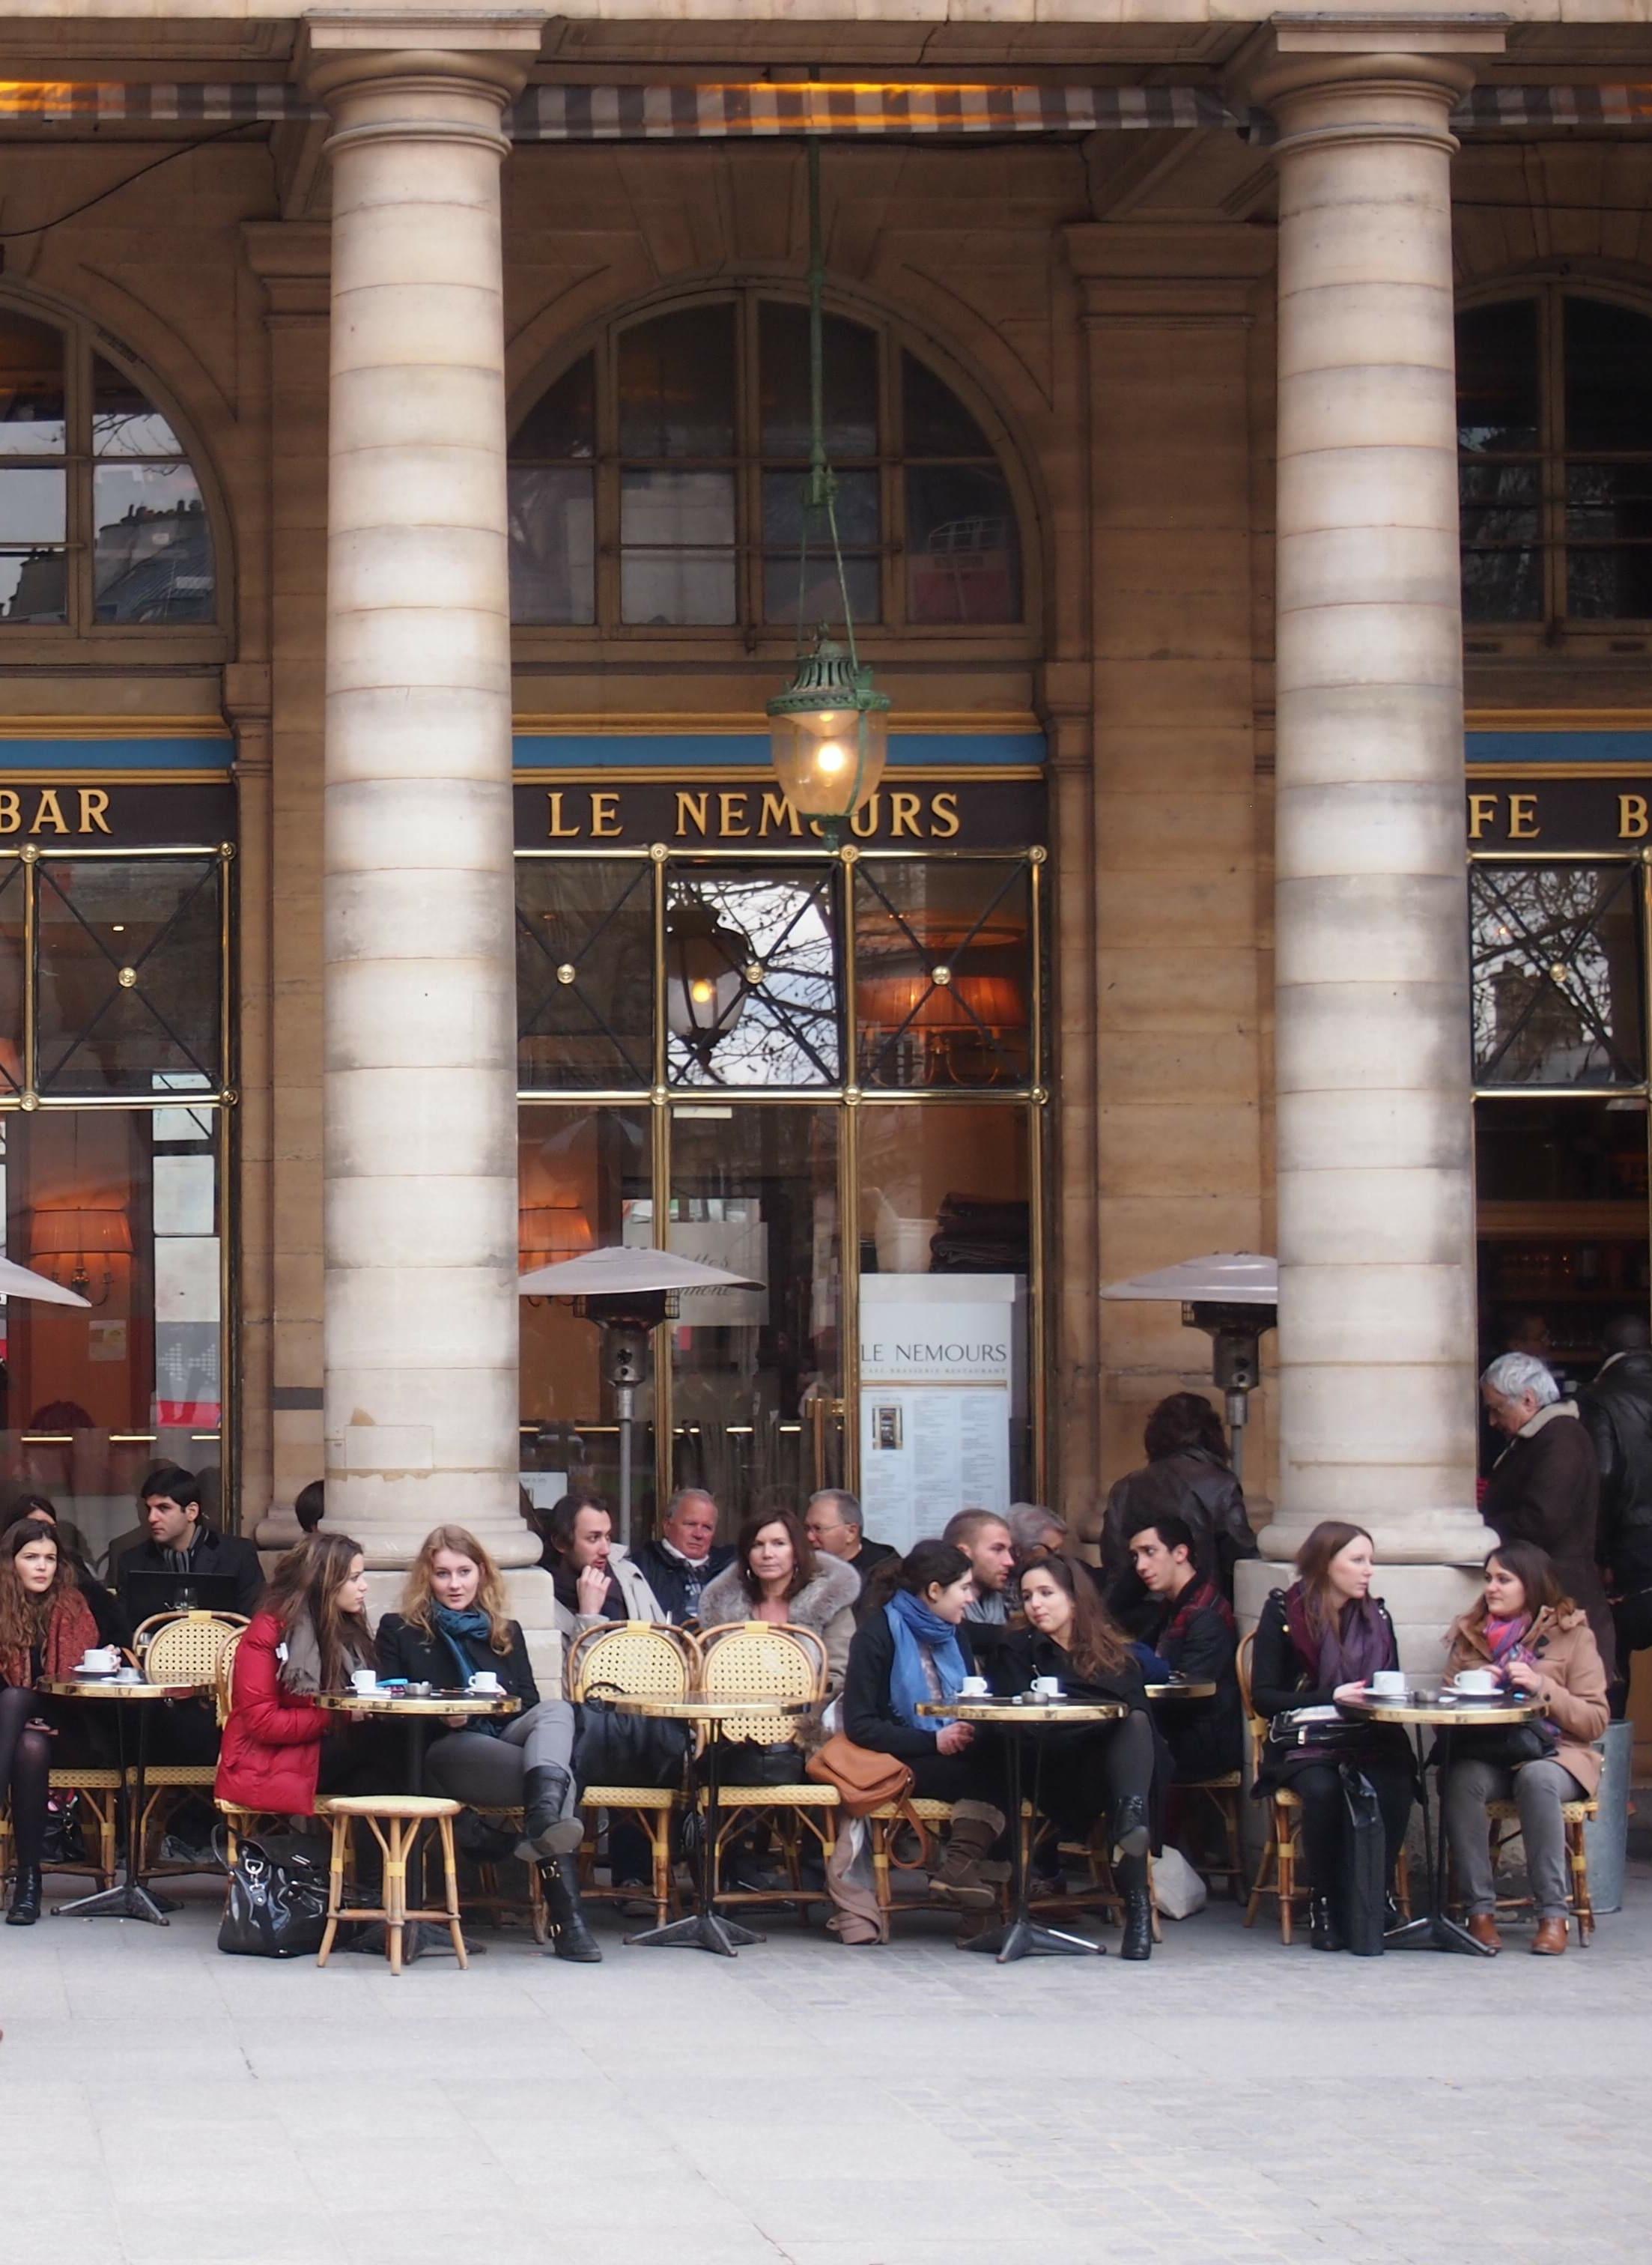 13-4-cafe-nemours-palais-royal.jpg